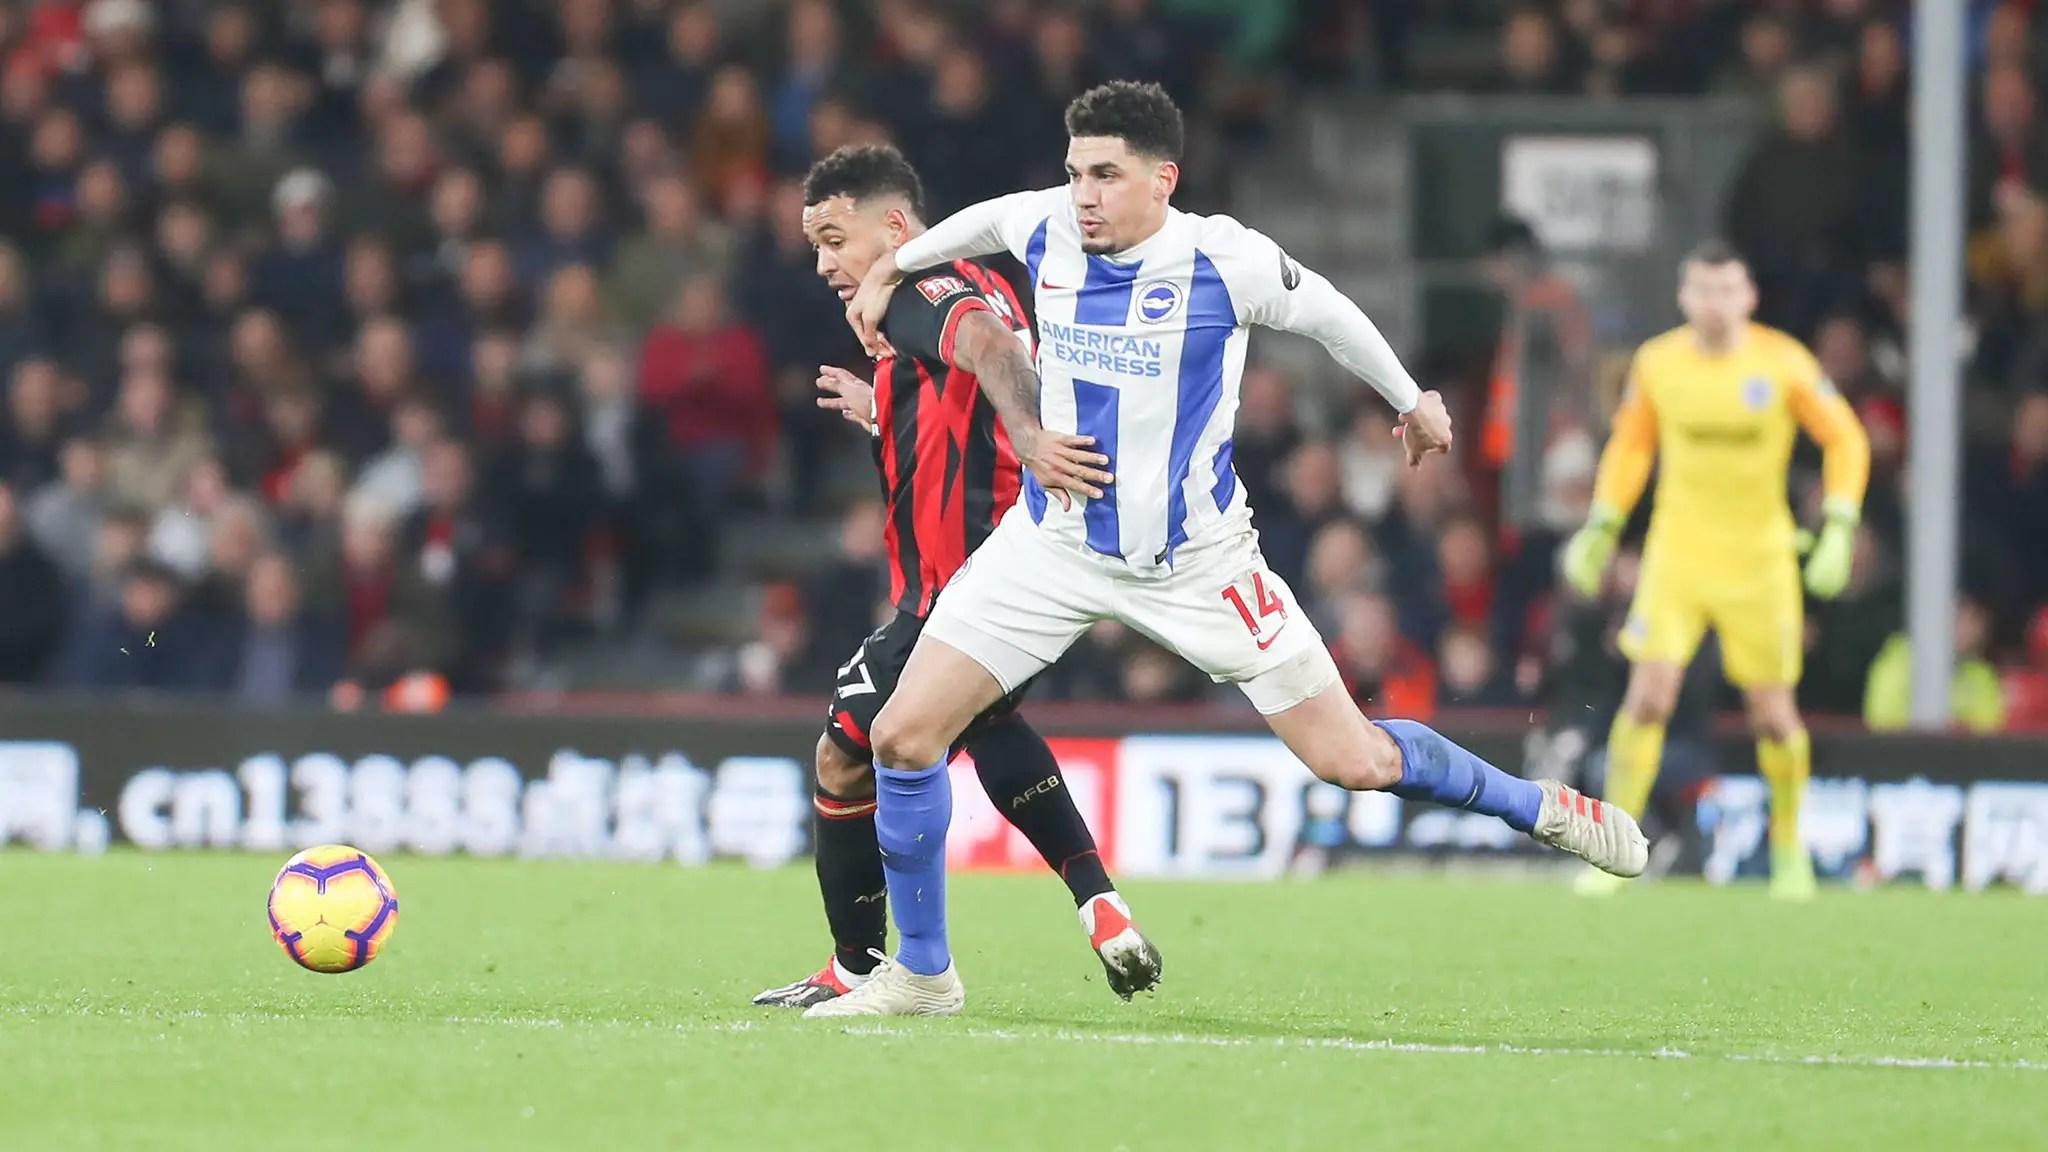 Balogun Rues Brighton Defeat To Bournemouth, Focuses On Arsenal Clash